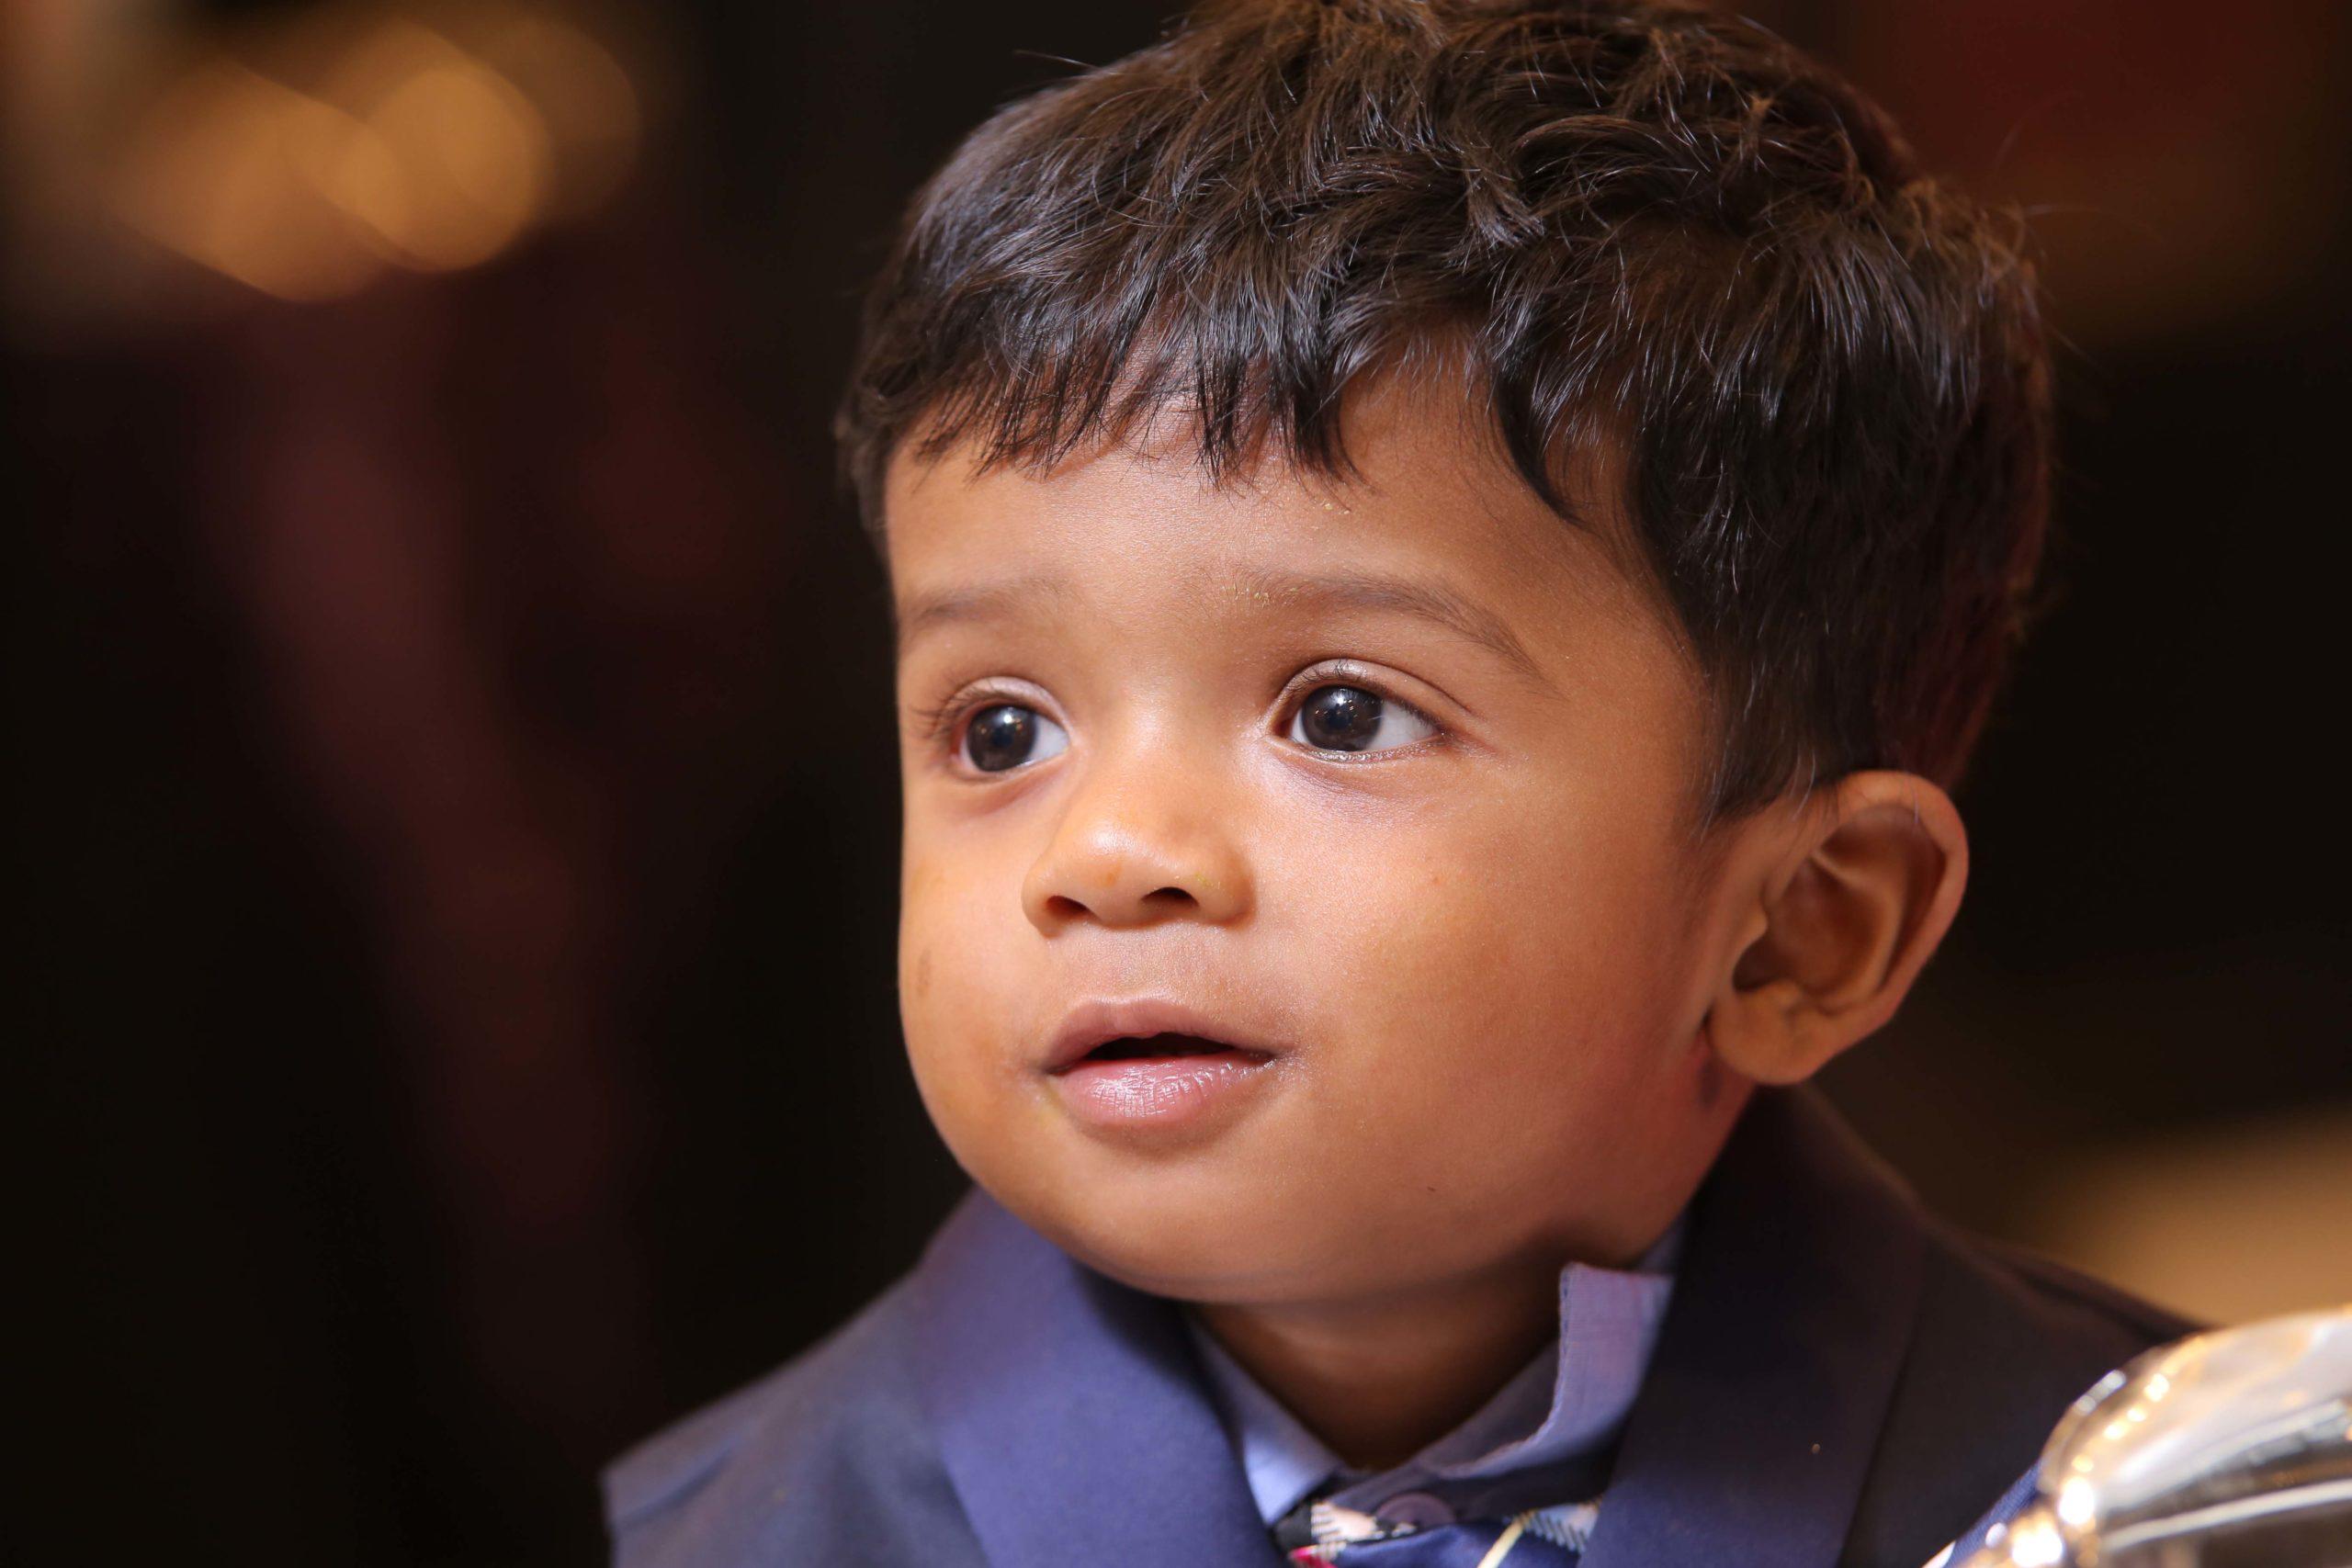 varun cinematic films Birthday photography